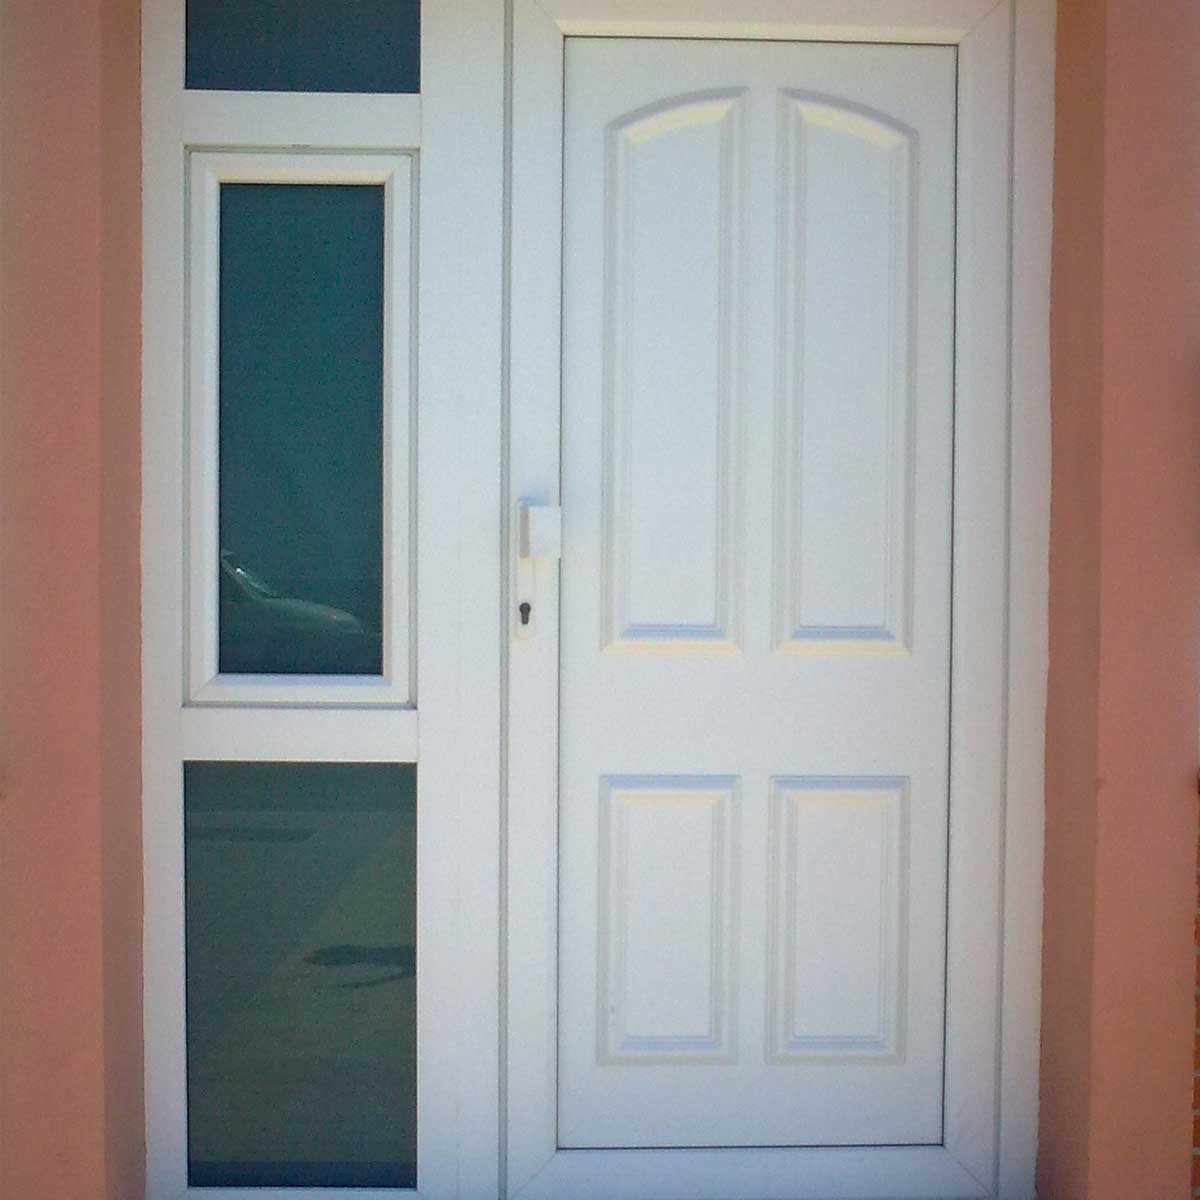 Puertas exteriores de pvc cheap tempohiades with puertas - Puertas de exterior de pvc ...